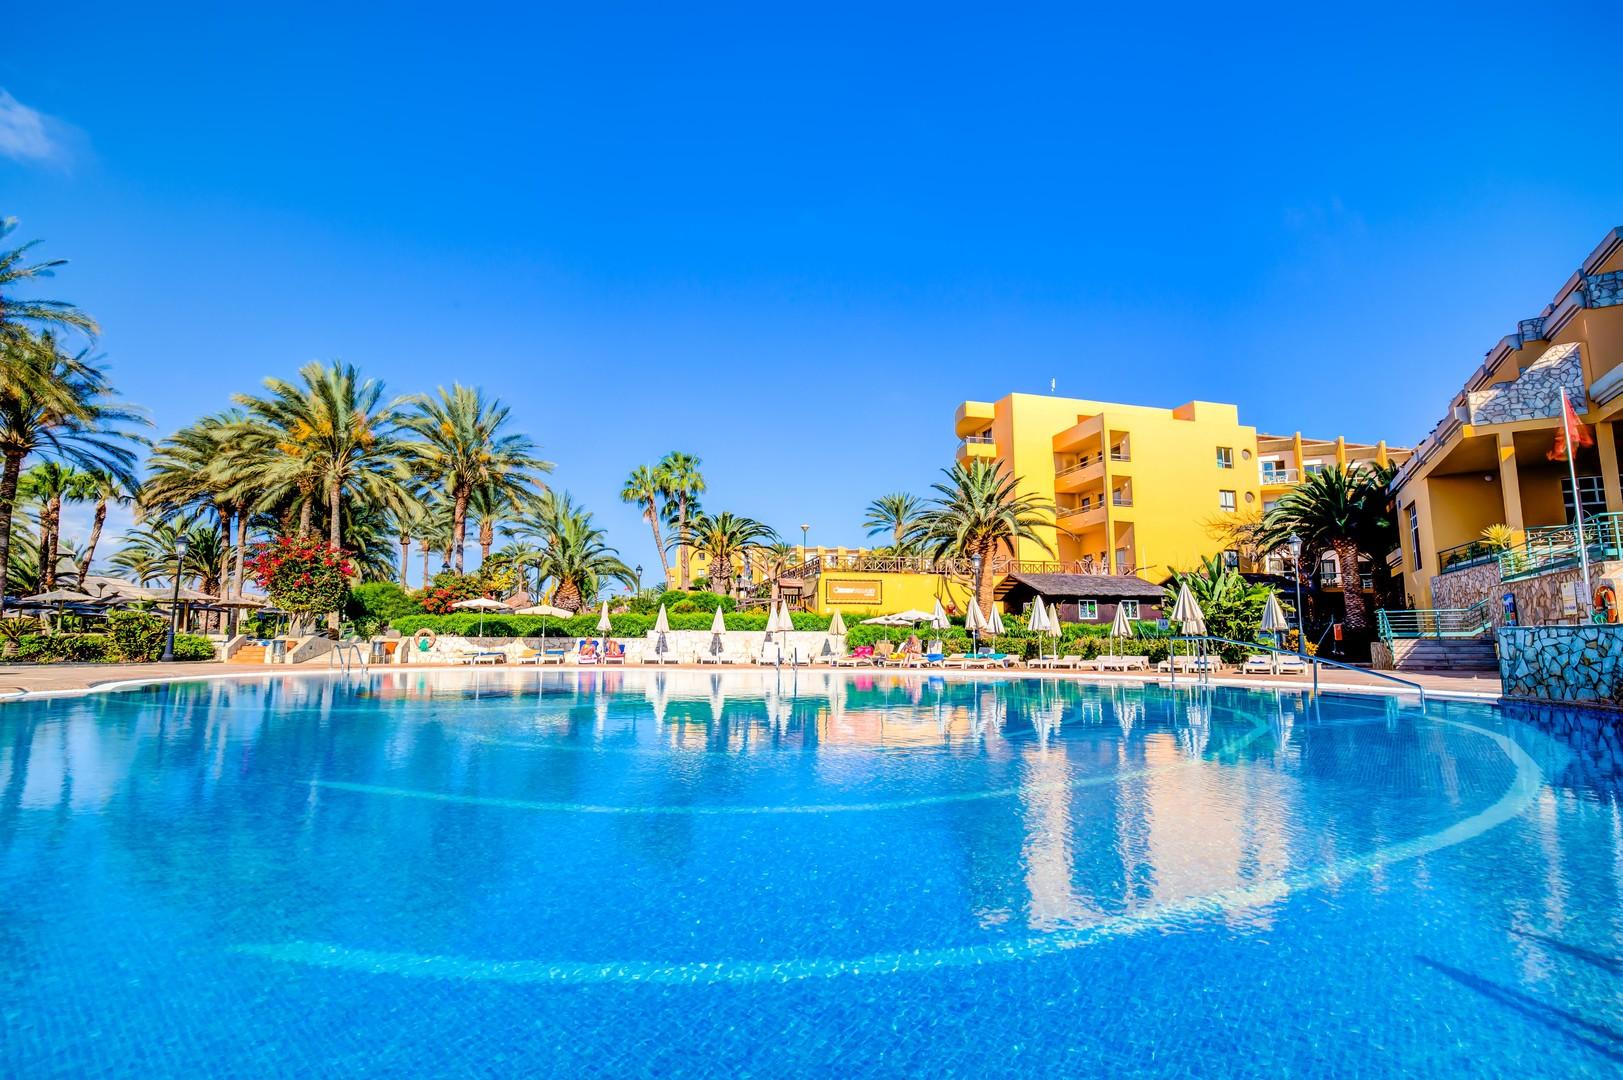 Hotel SBH Costa Calma Beach #3